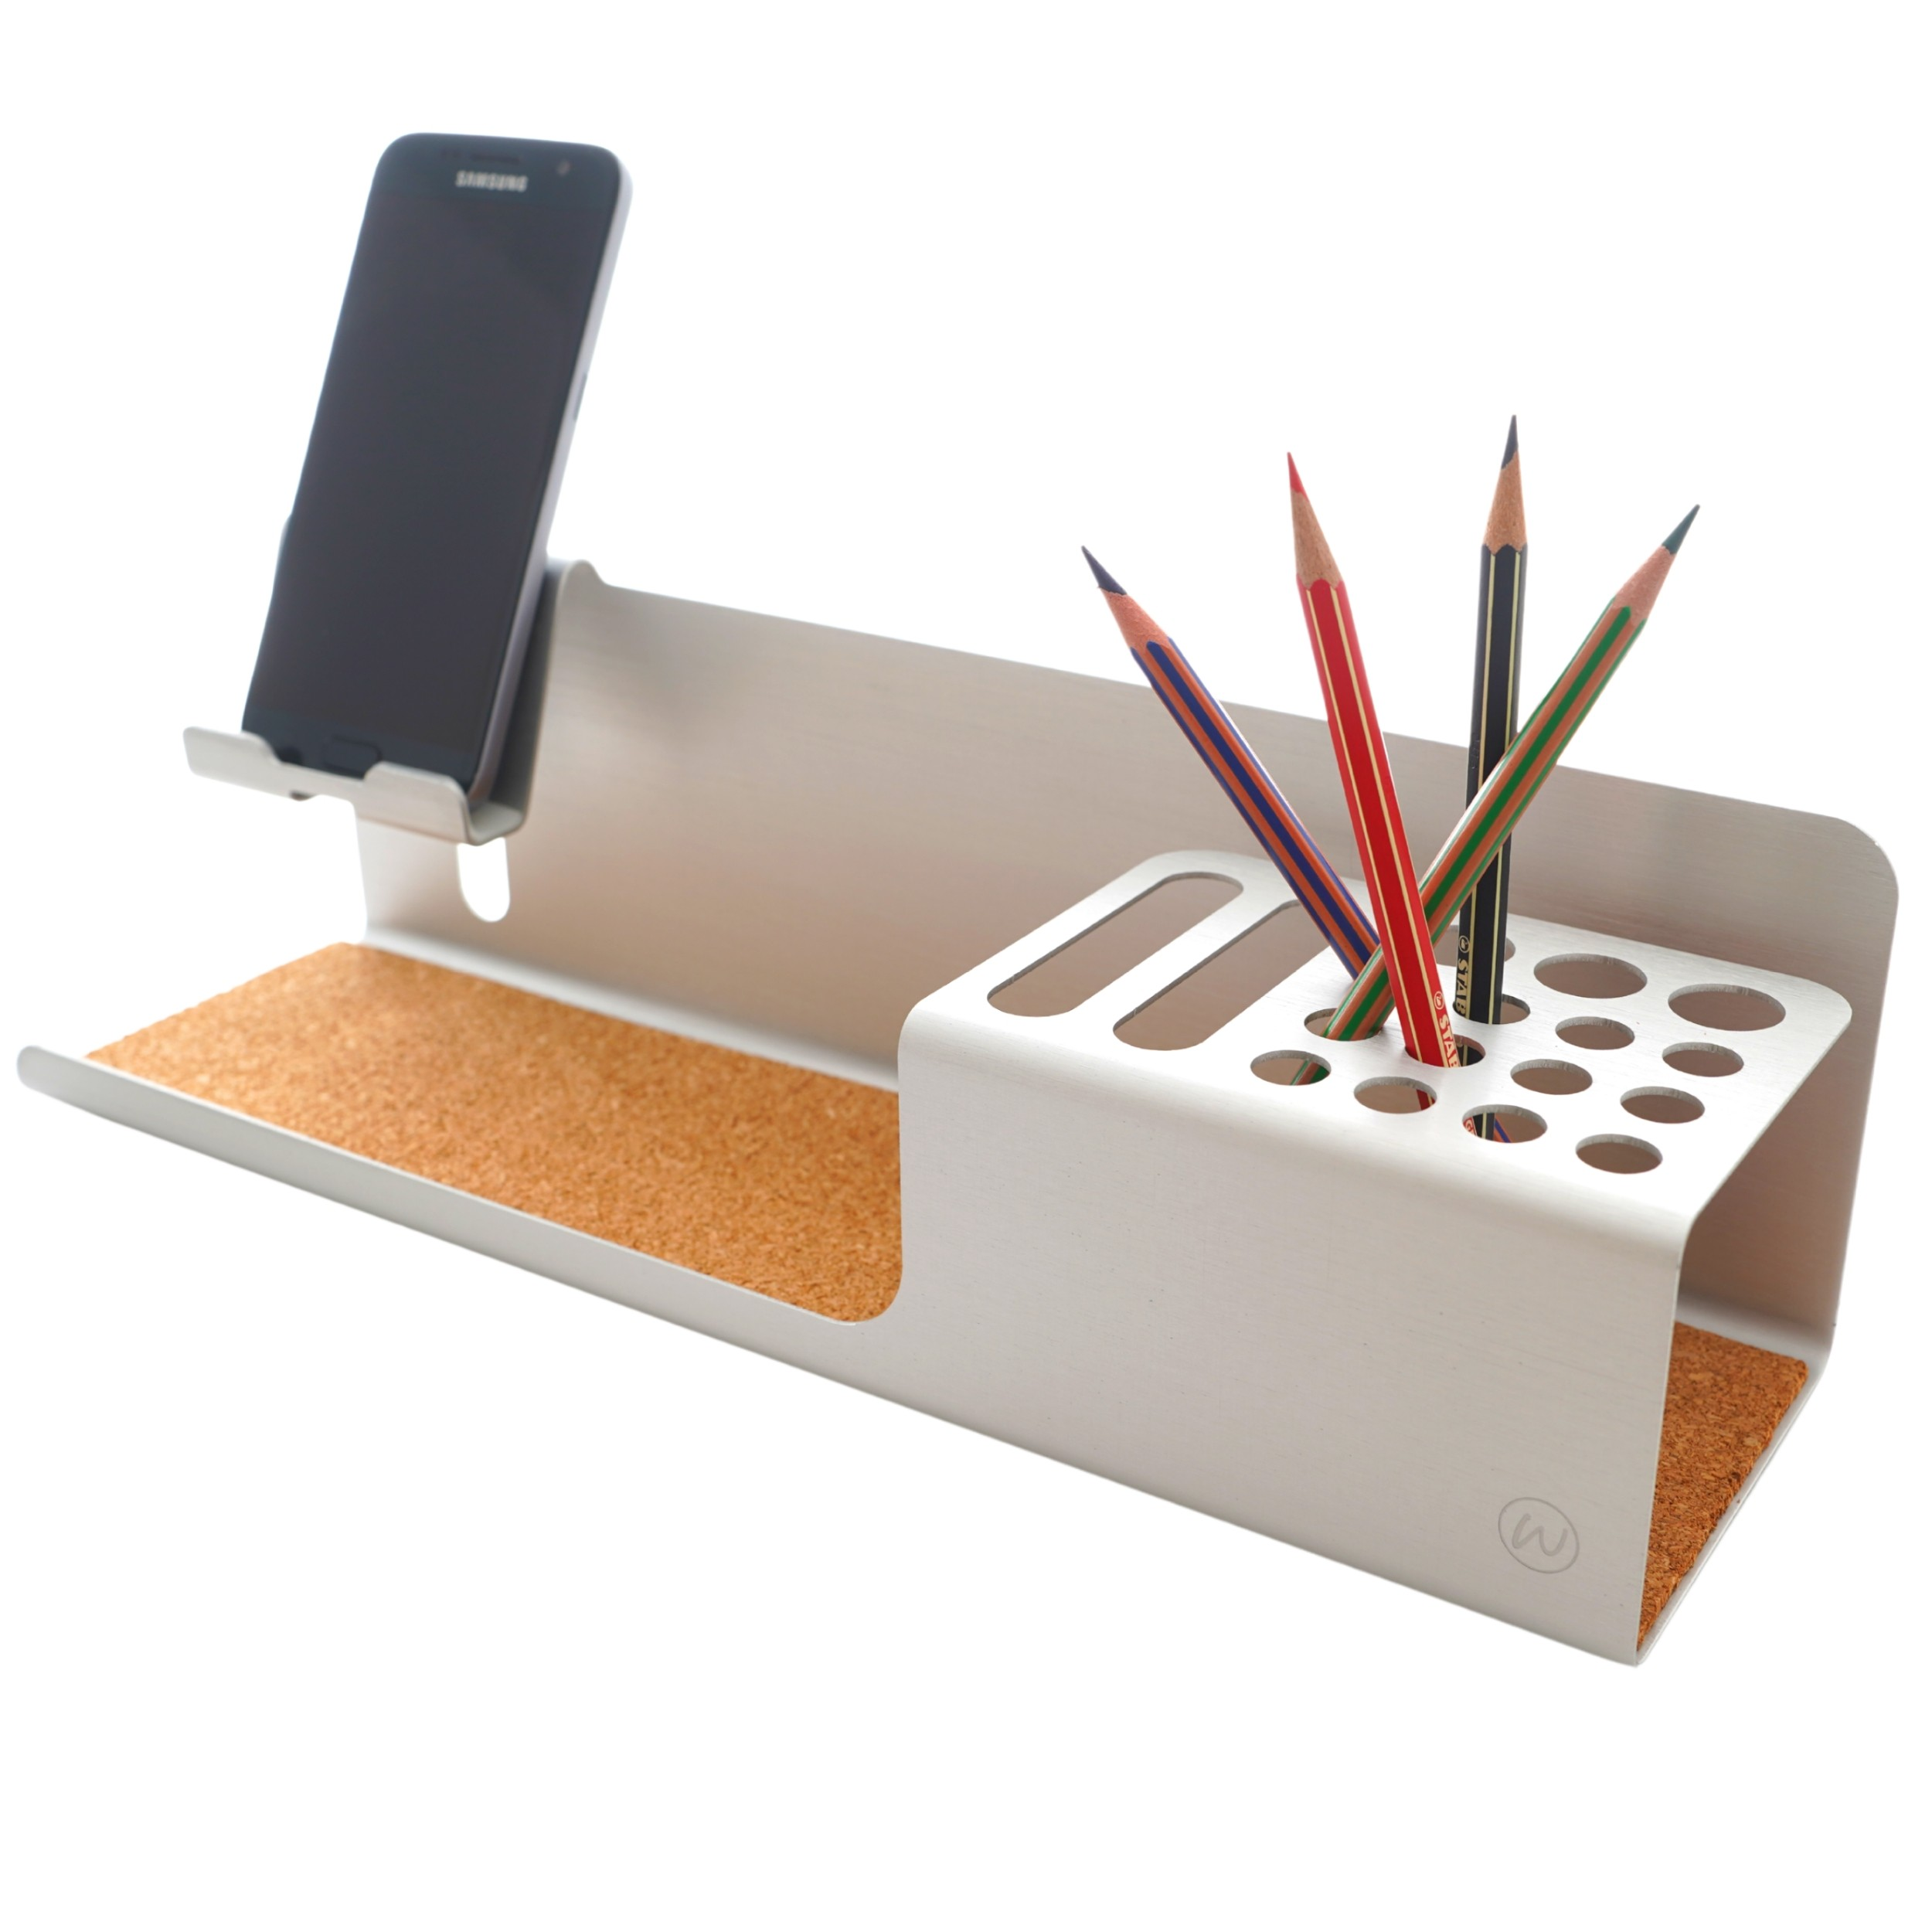 Organiseur telephone portable aluminum charge iphone usb support bureau organisateur rangement feutre stylo crayon samsung pot